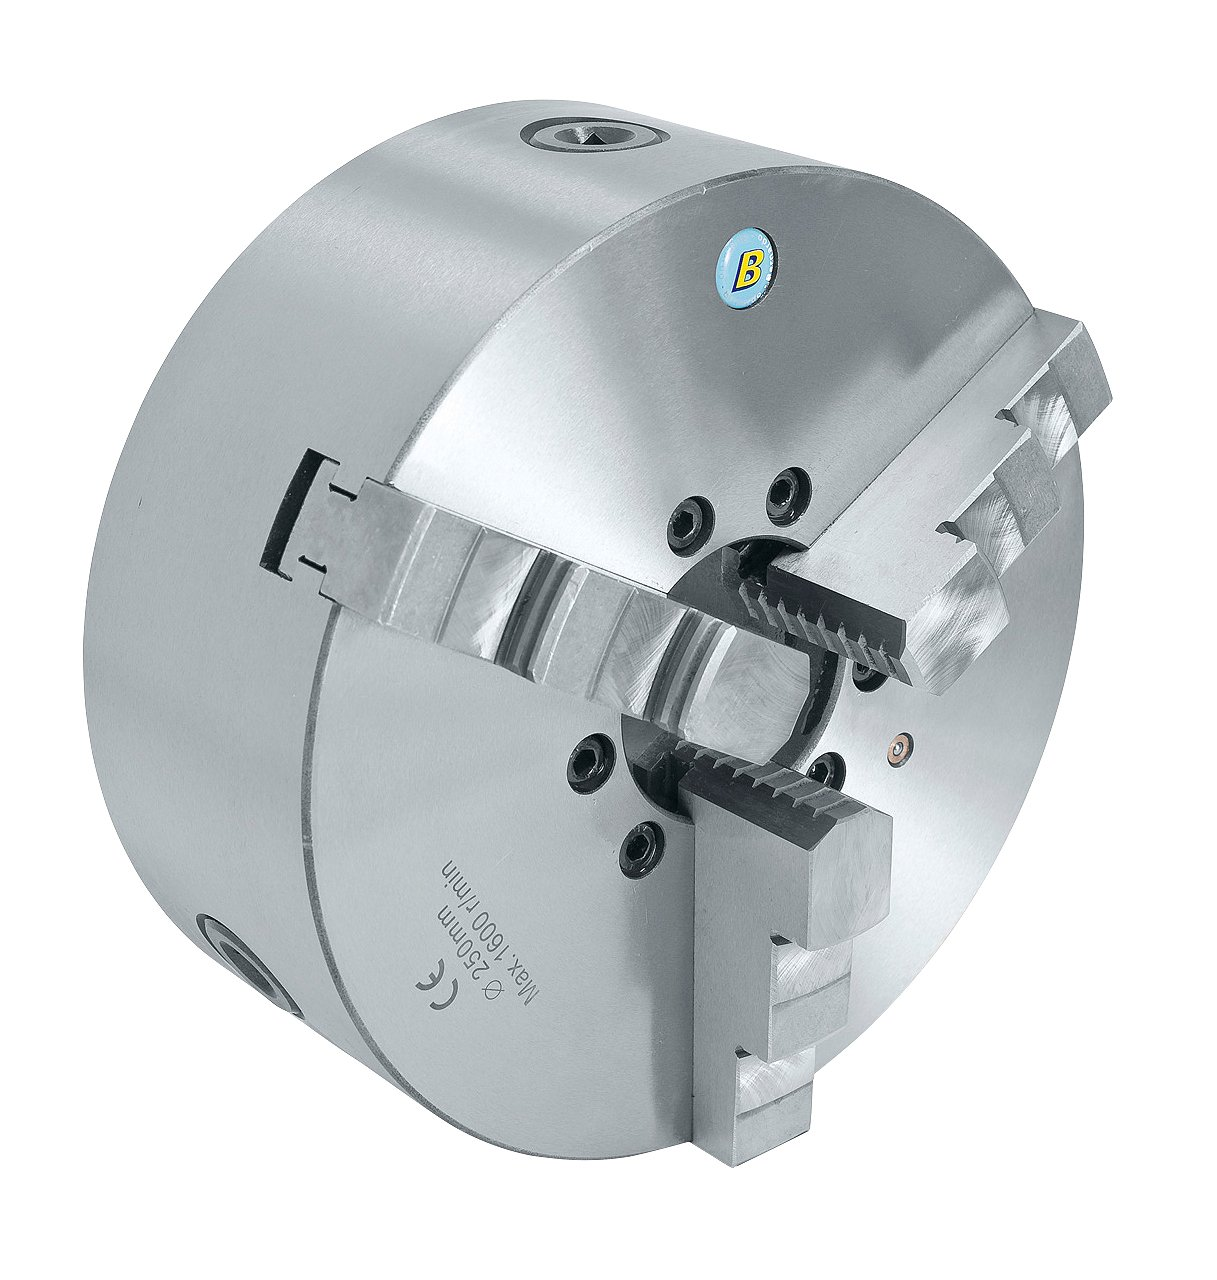 3 bakket centrerpatron standard DK11-315/D6